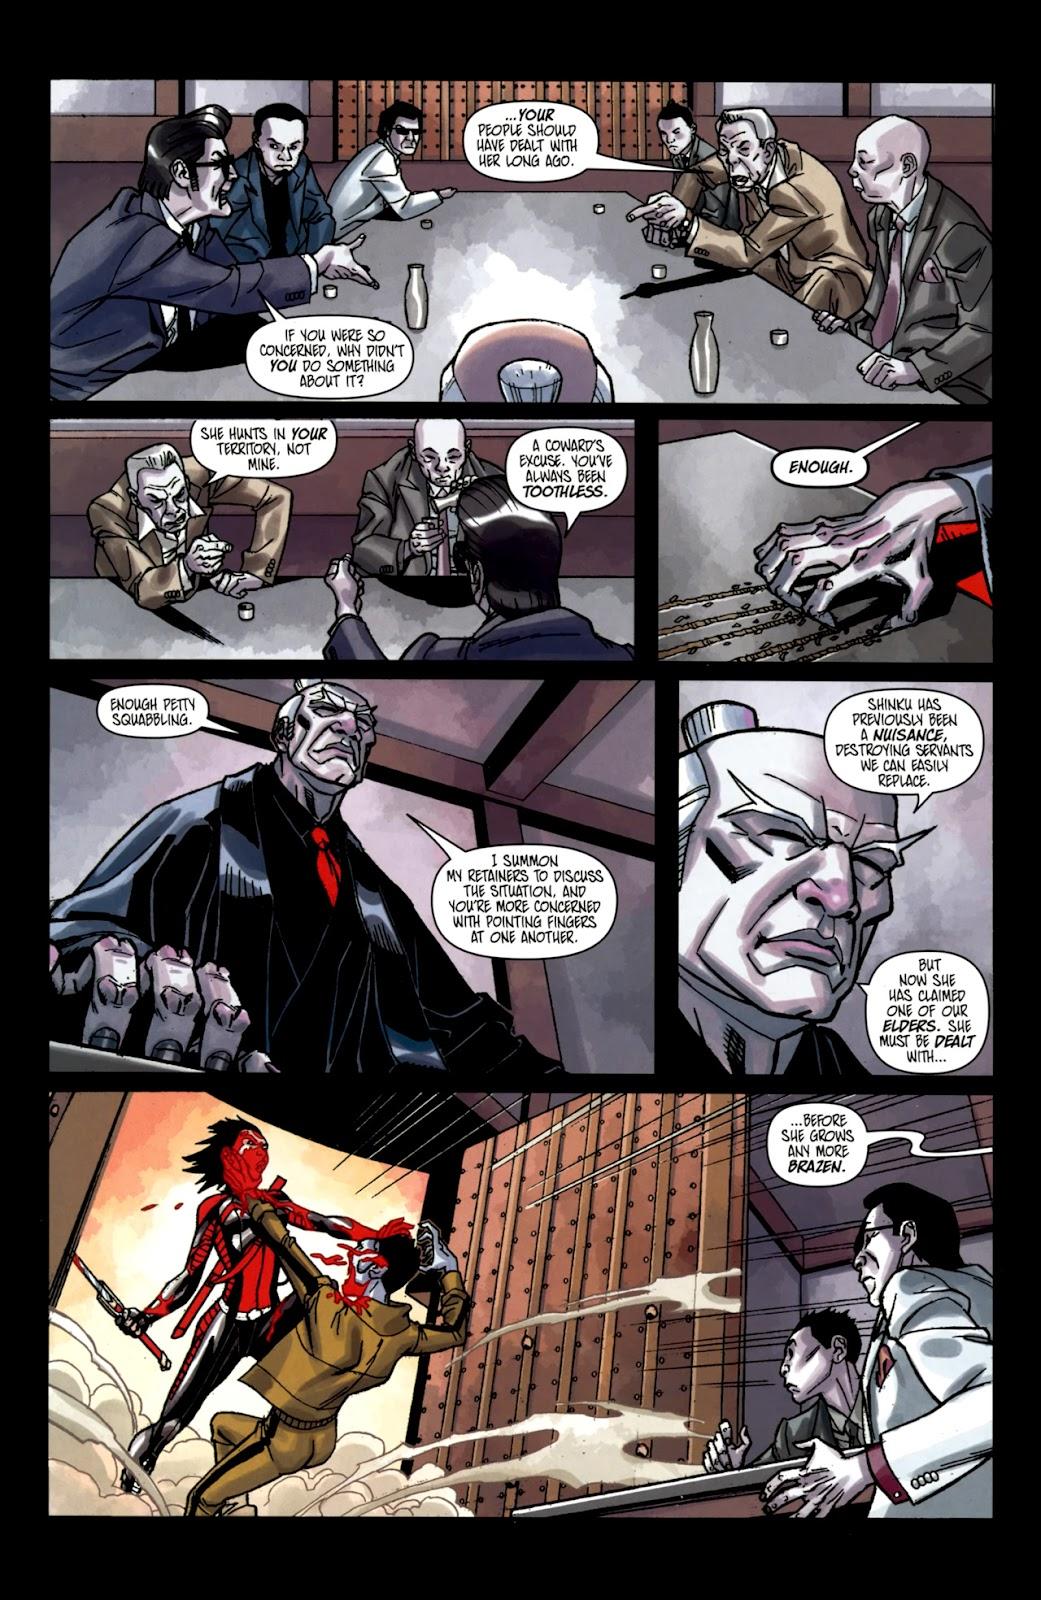 Read online Shinku comic -  Issue #2 - 16